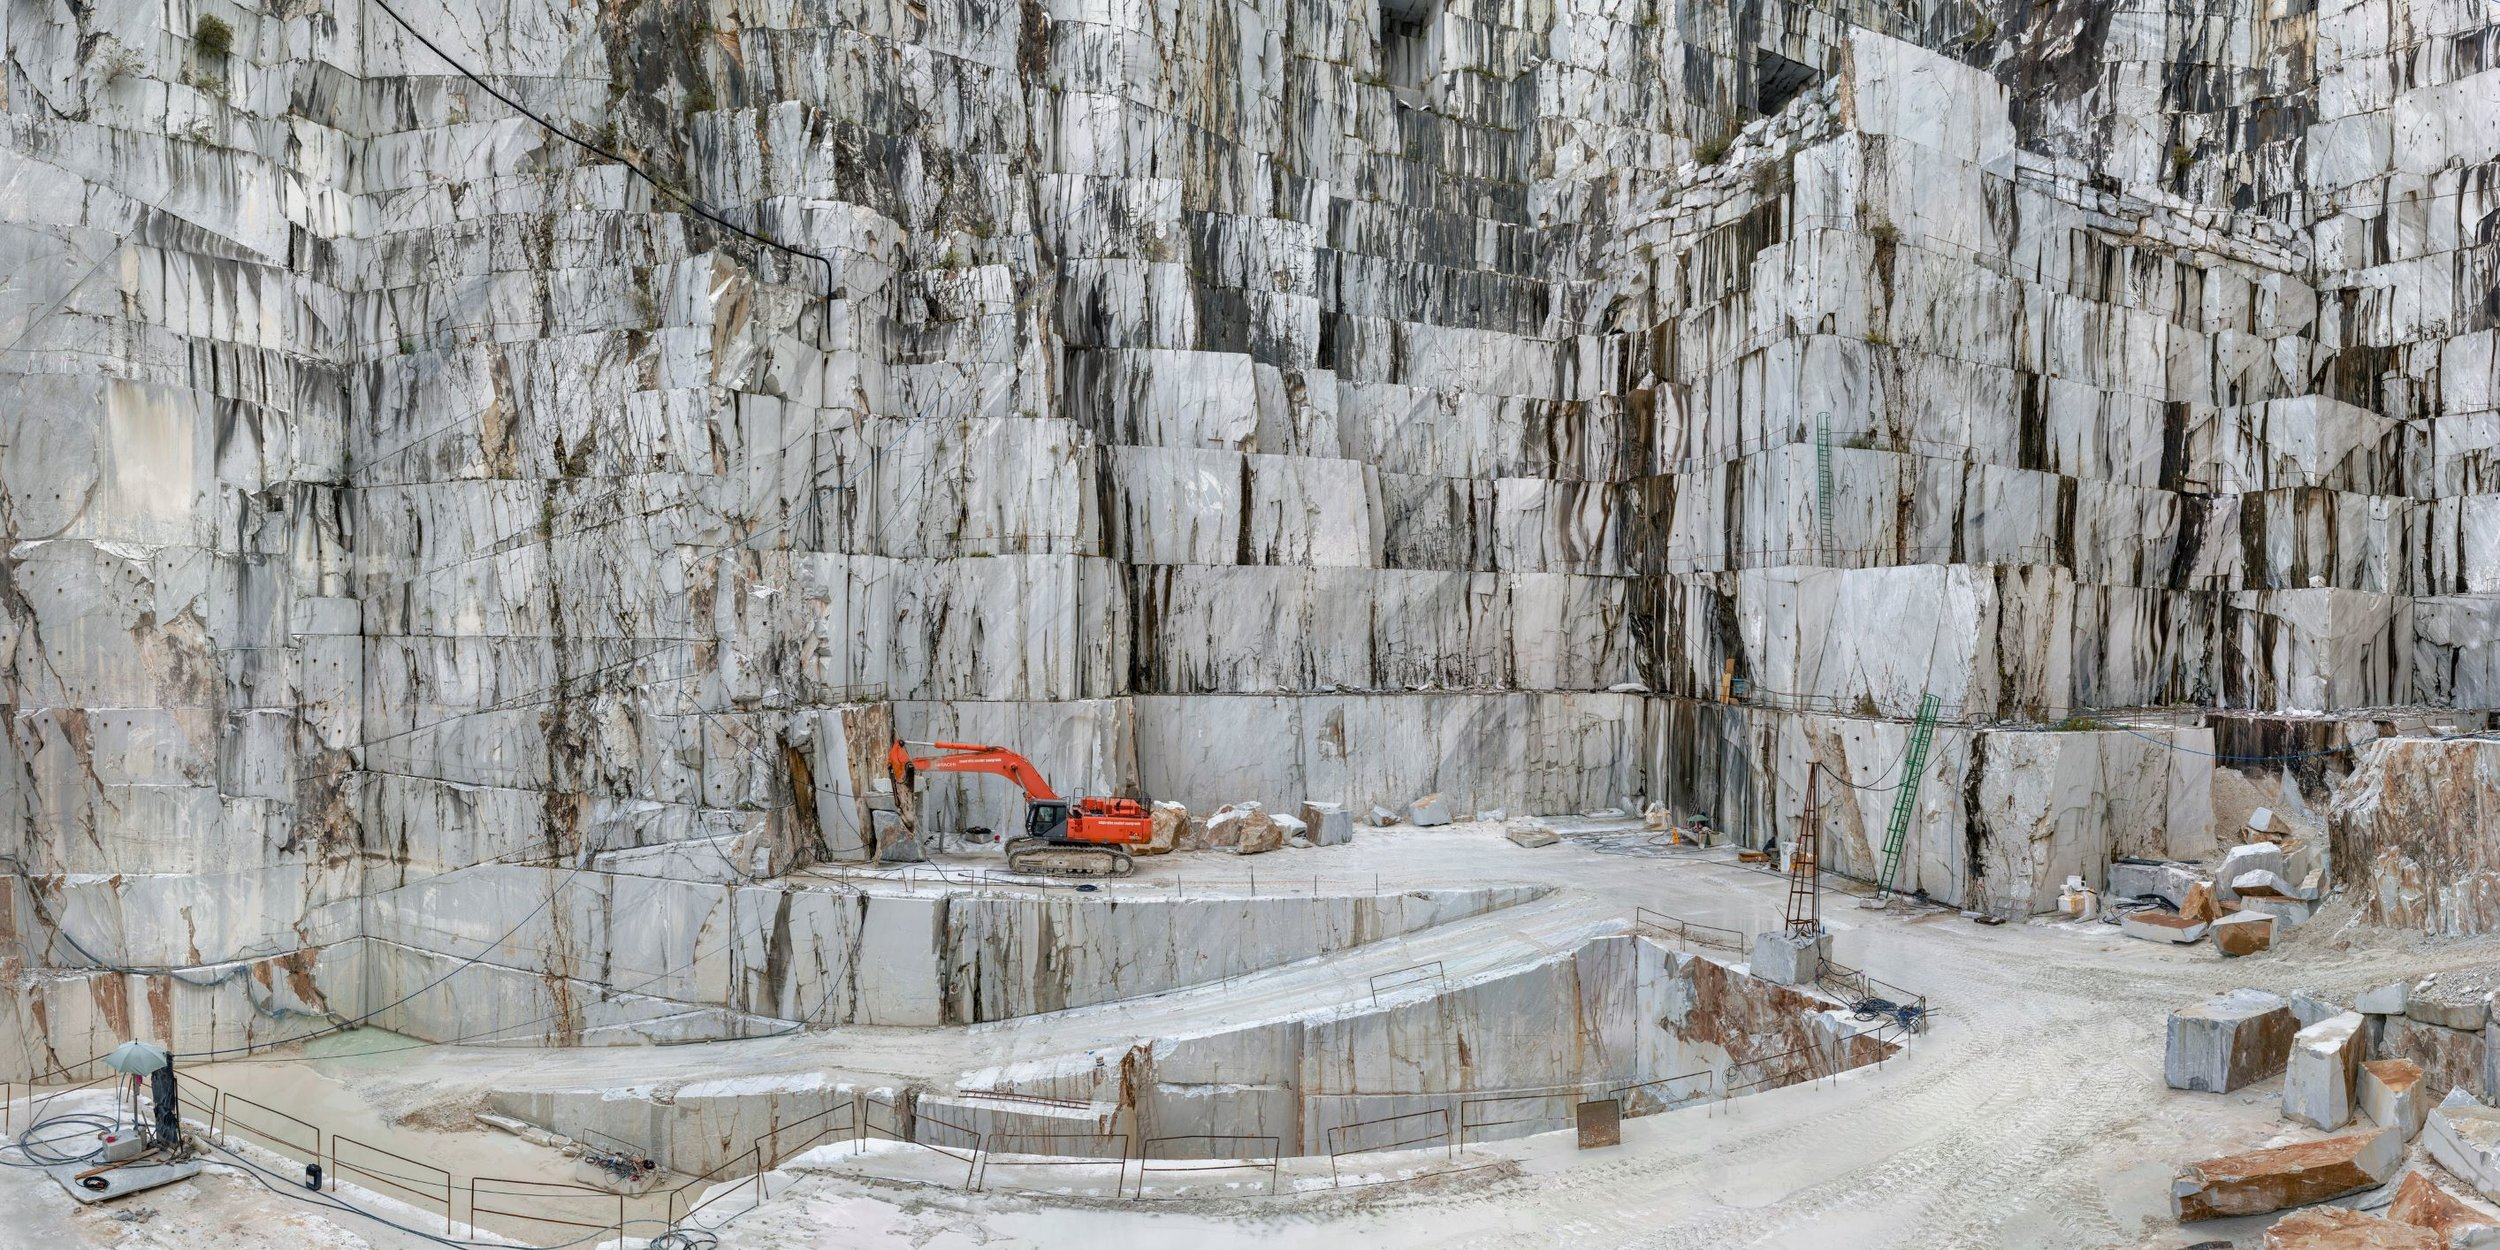 Cave del marmo a Carrara. Image: Burtynsky